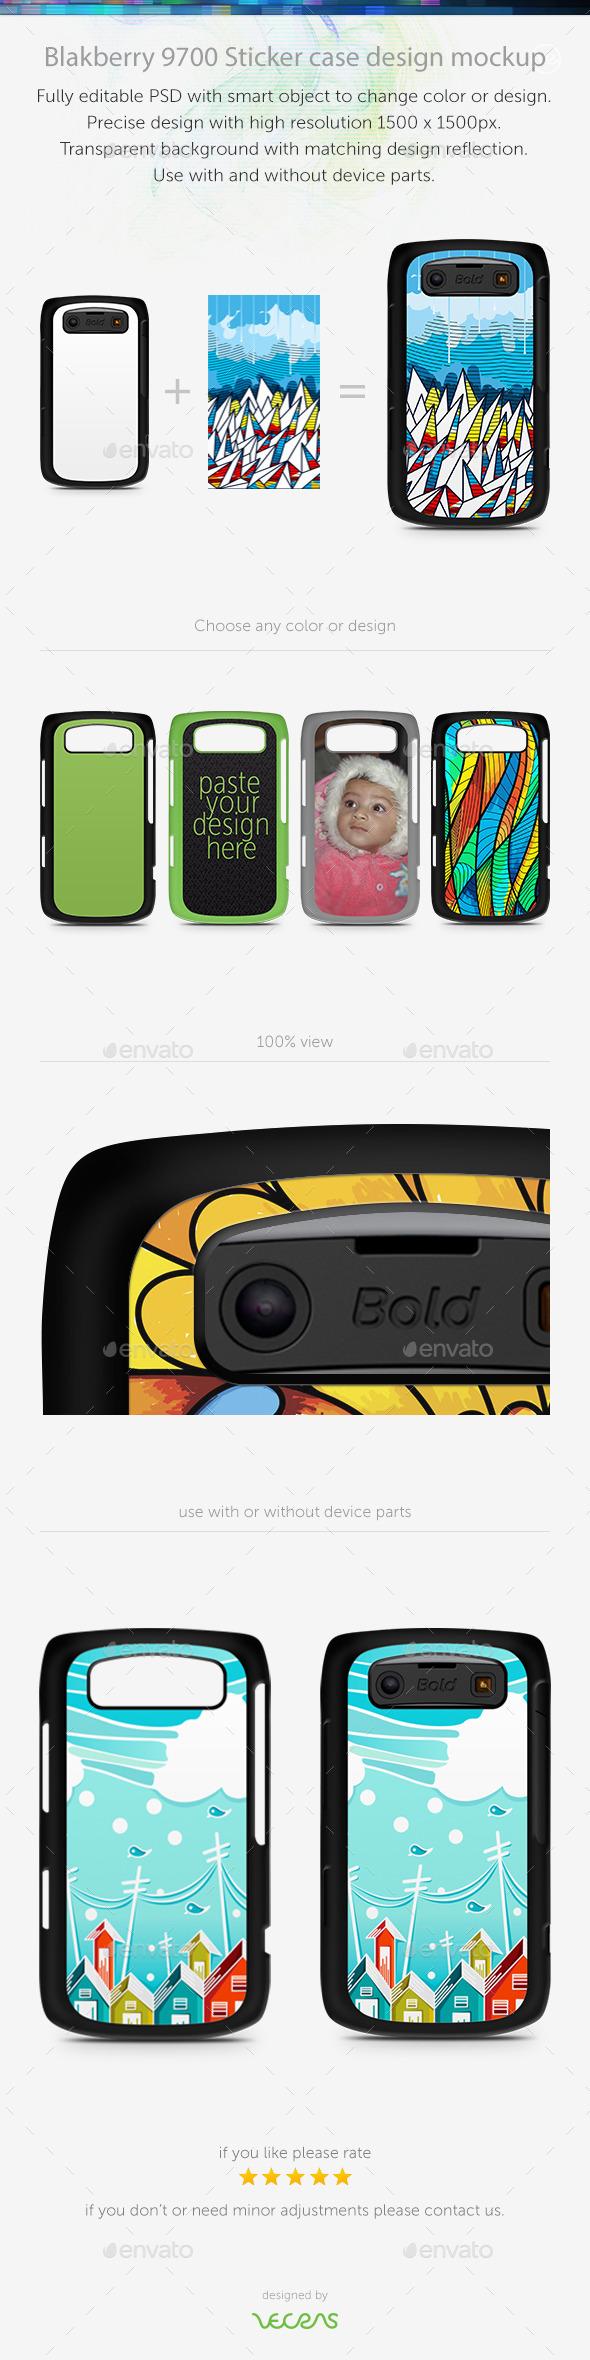 Blakberry 9700 Sticker Case Design Mockup